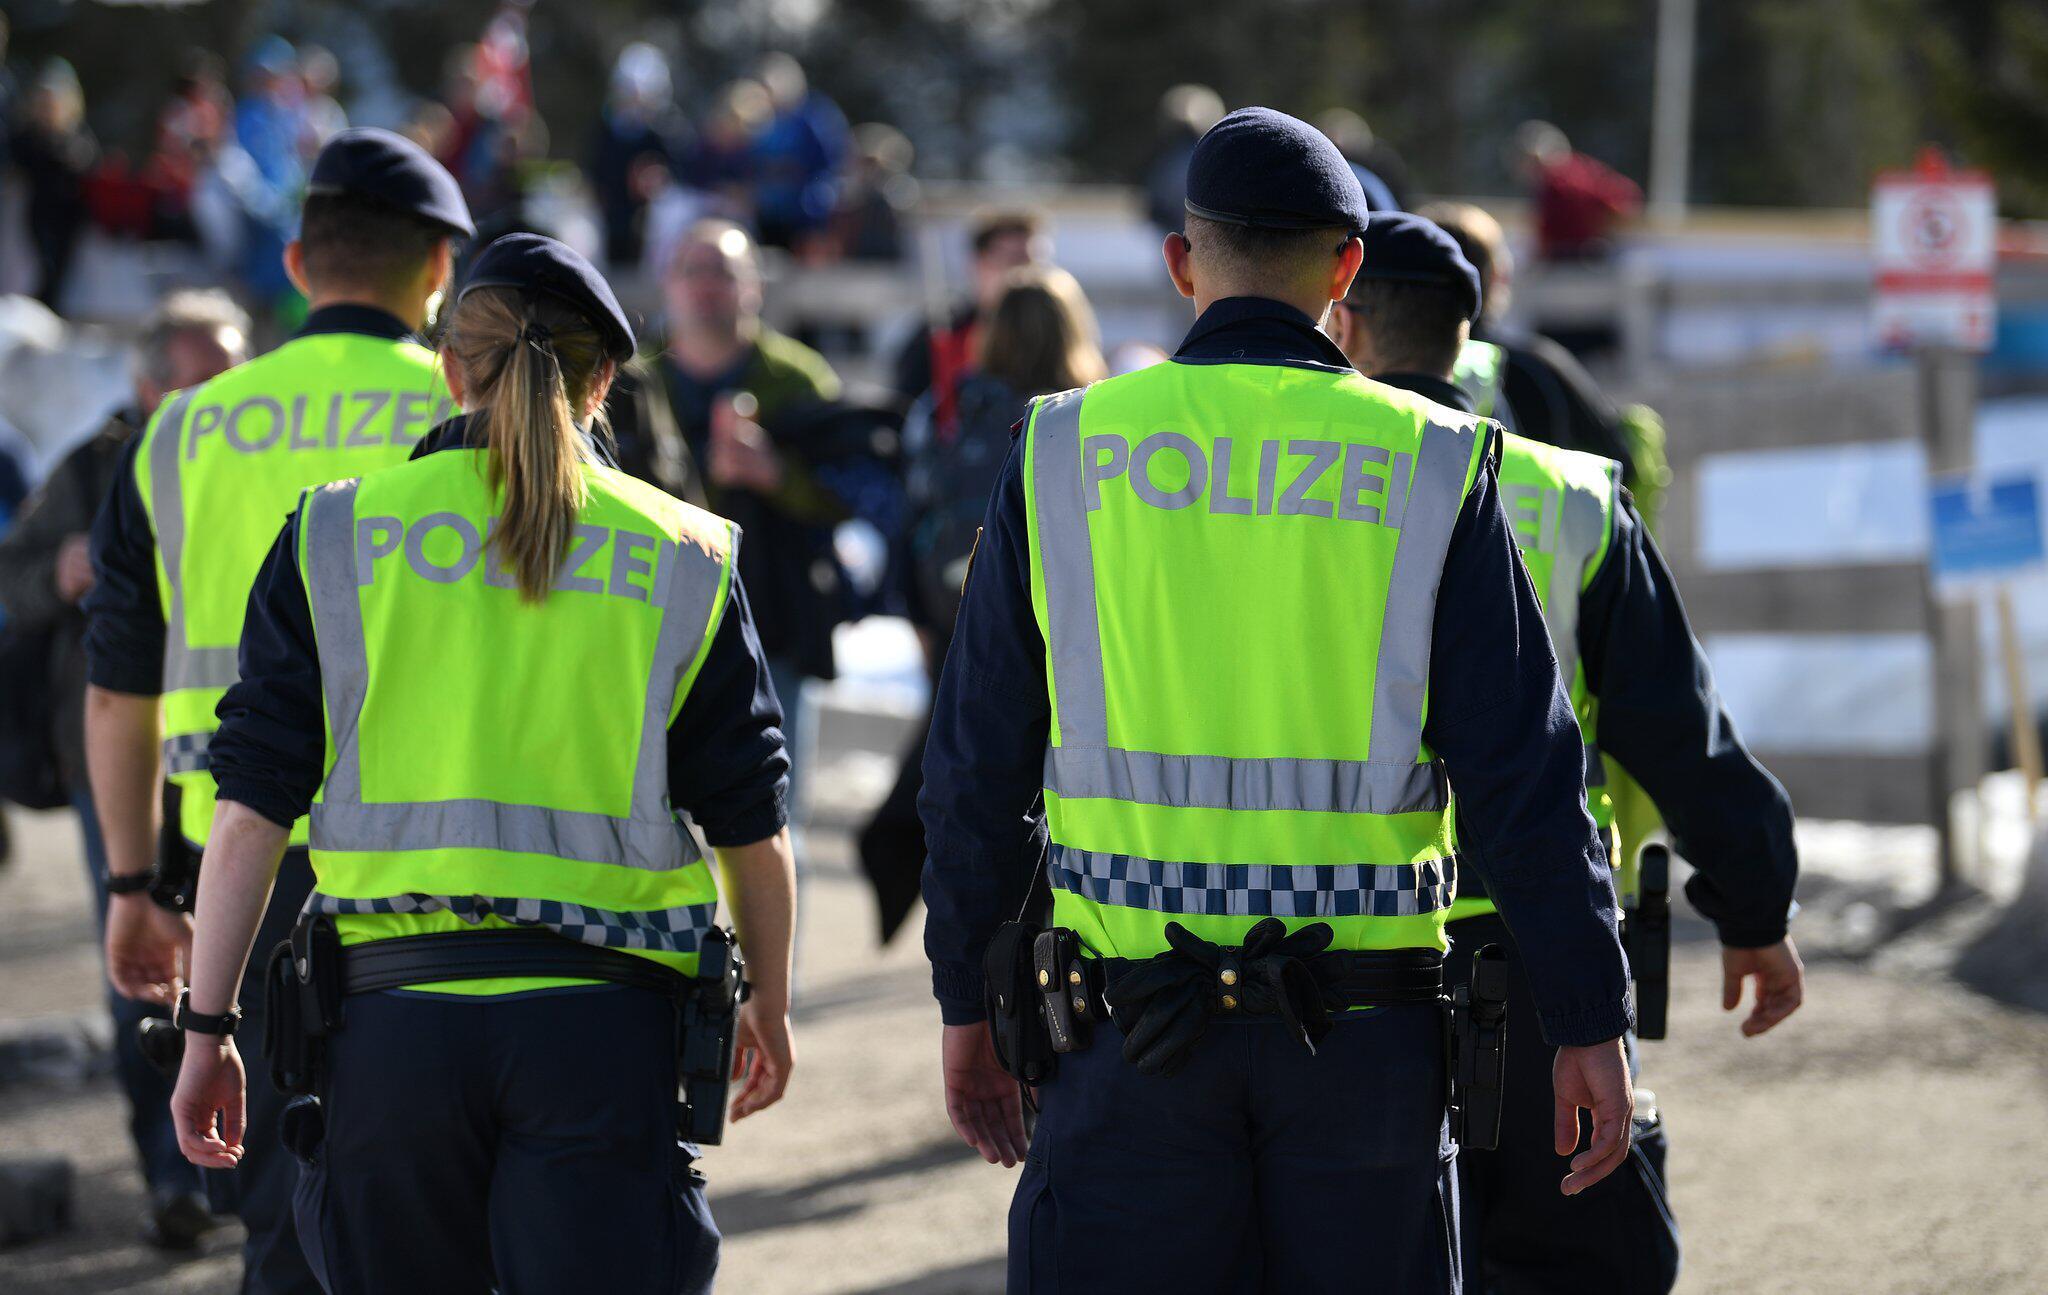 Bild zu Anti-doping raids at Nordic World Ski Championships in Seefeld